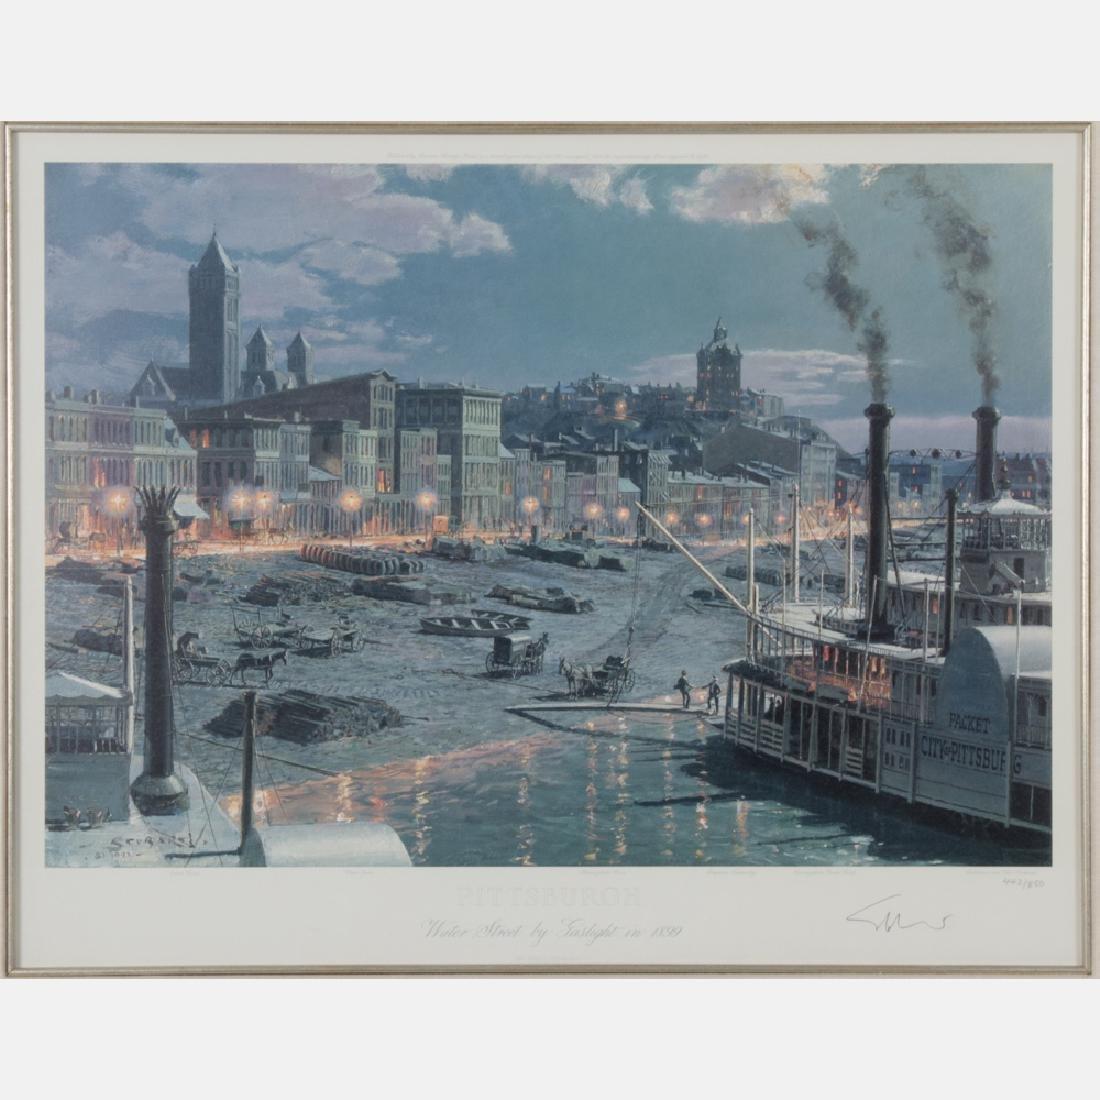 John Stobart (b.1929) Pittsburgh, Water Street by